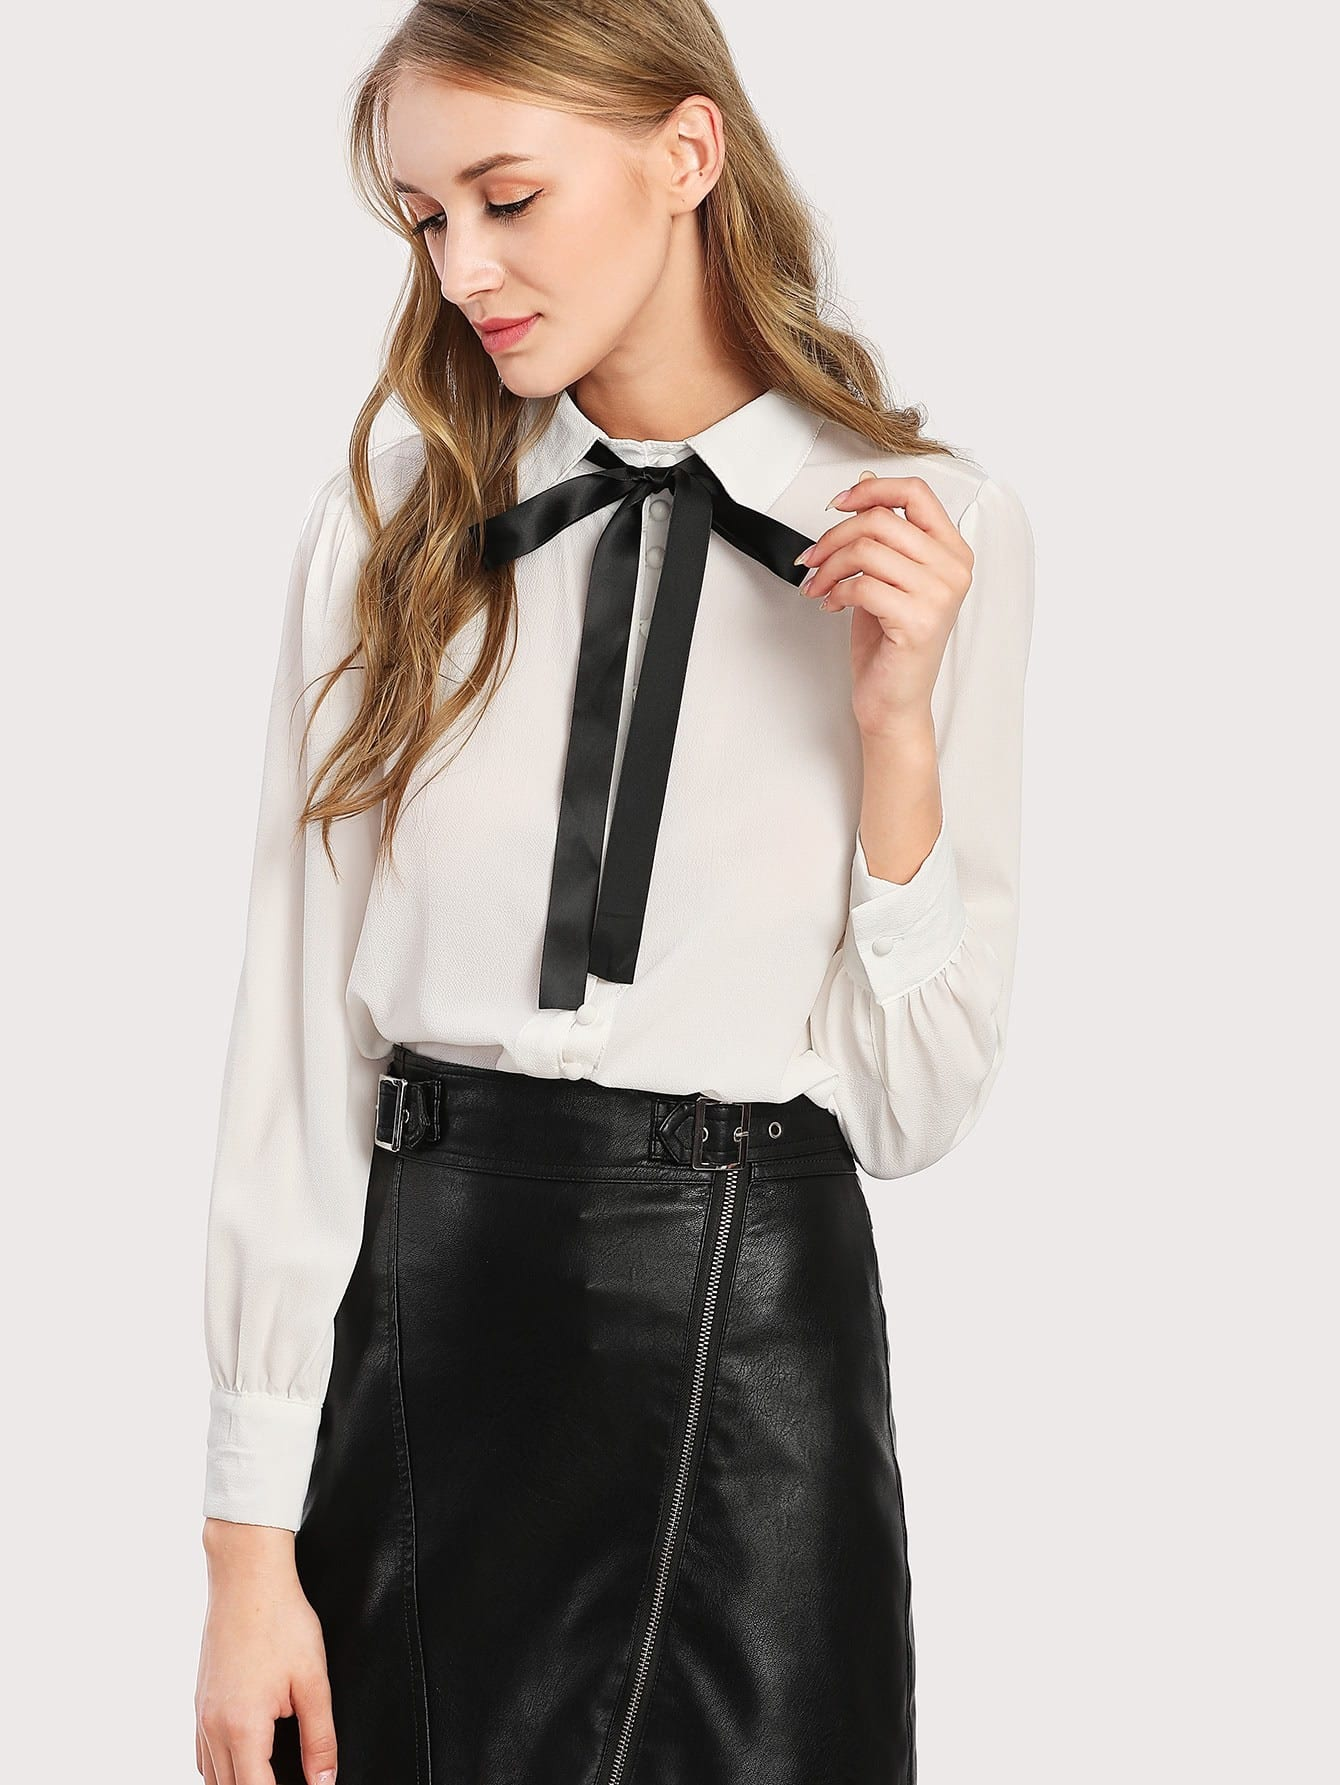 Bow Tie Neck Shirt